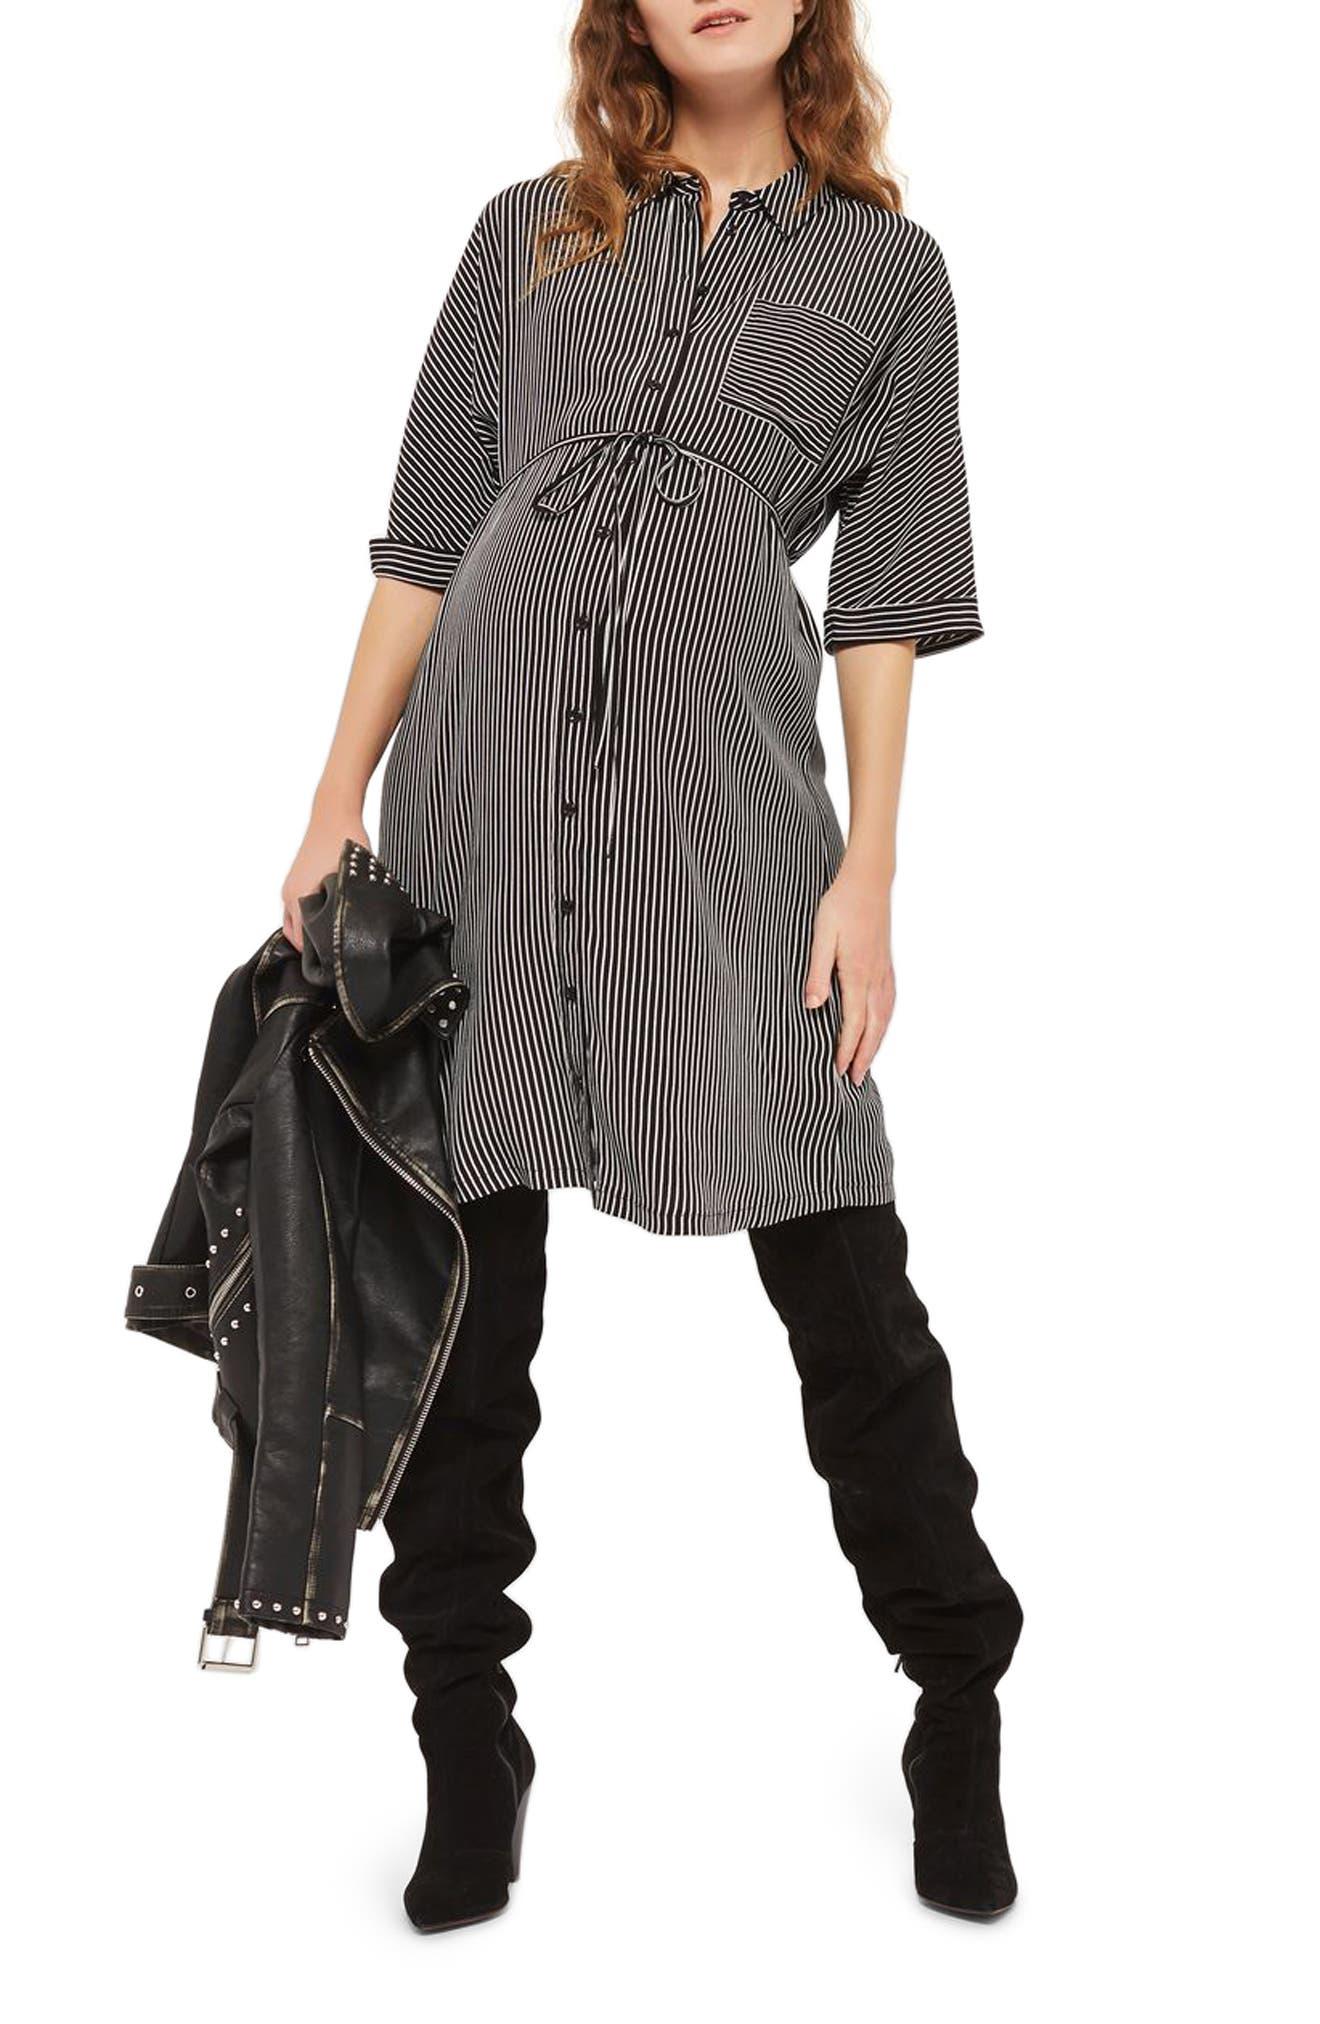 Alternate Image 1 Selected - Topshop Kady Stripe Maternity Shirtdress